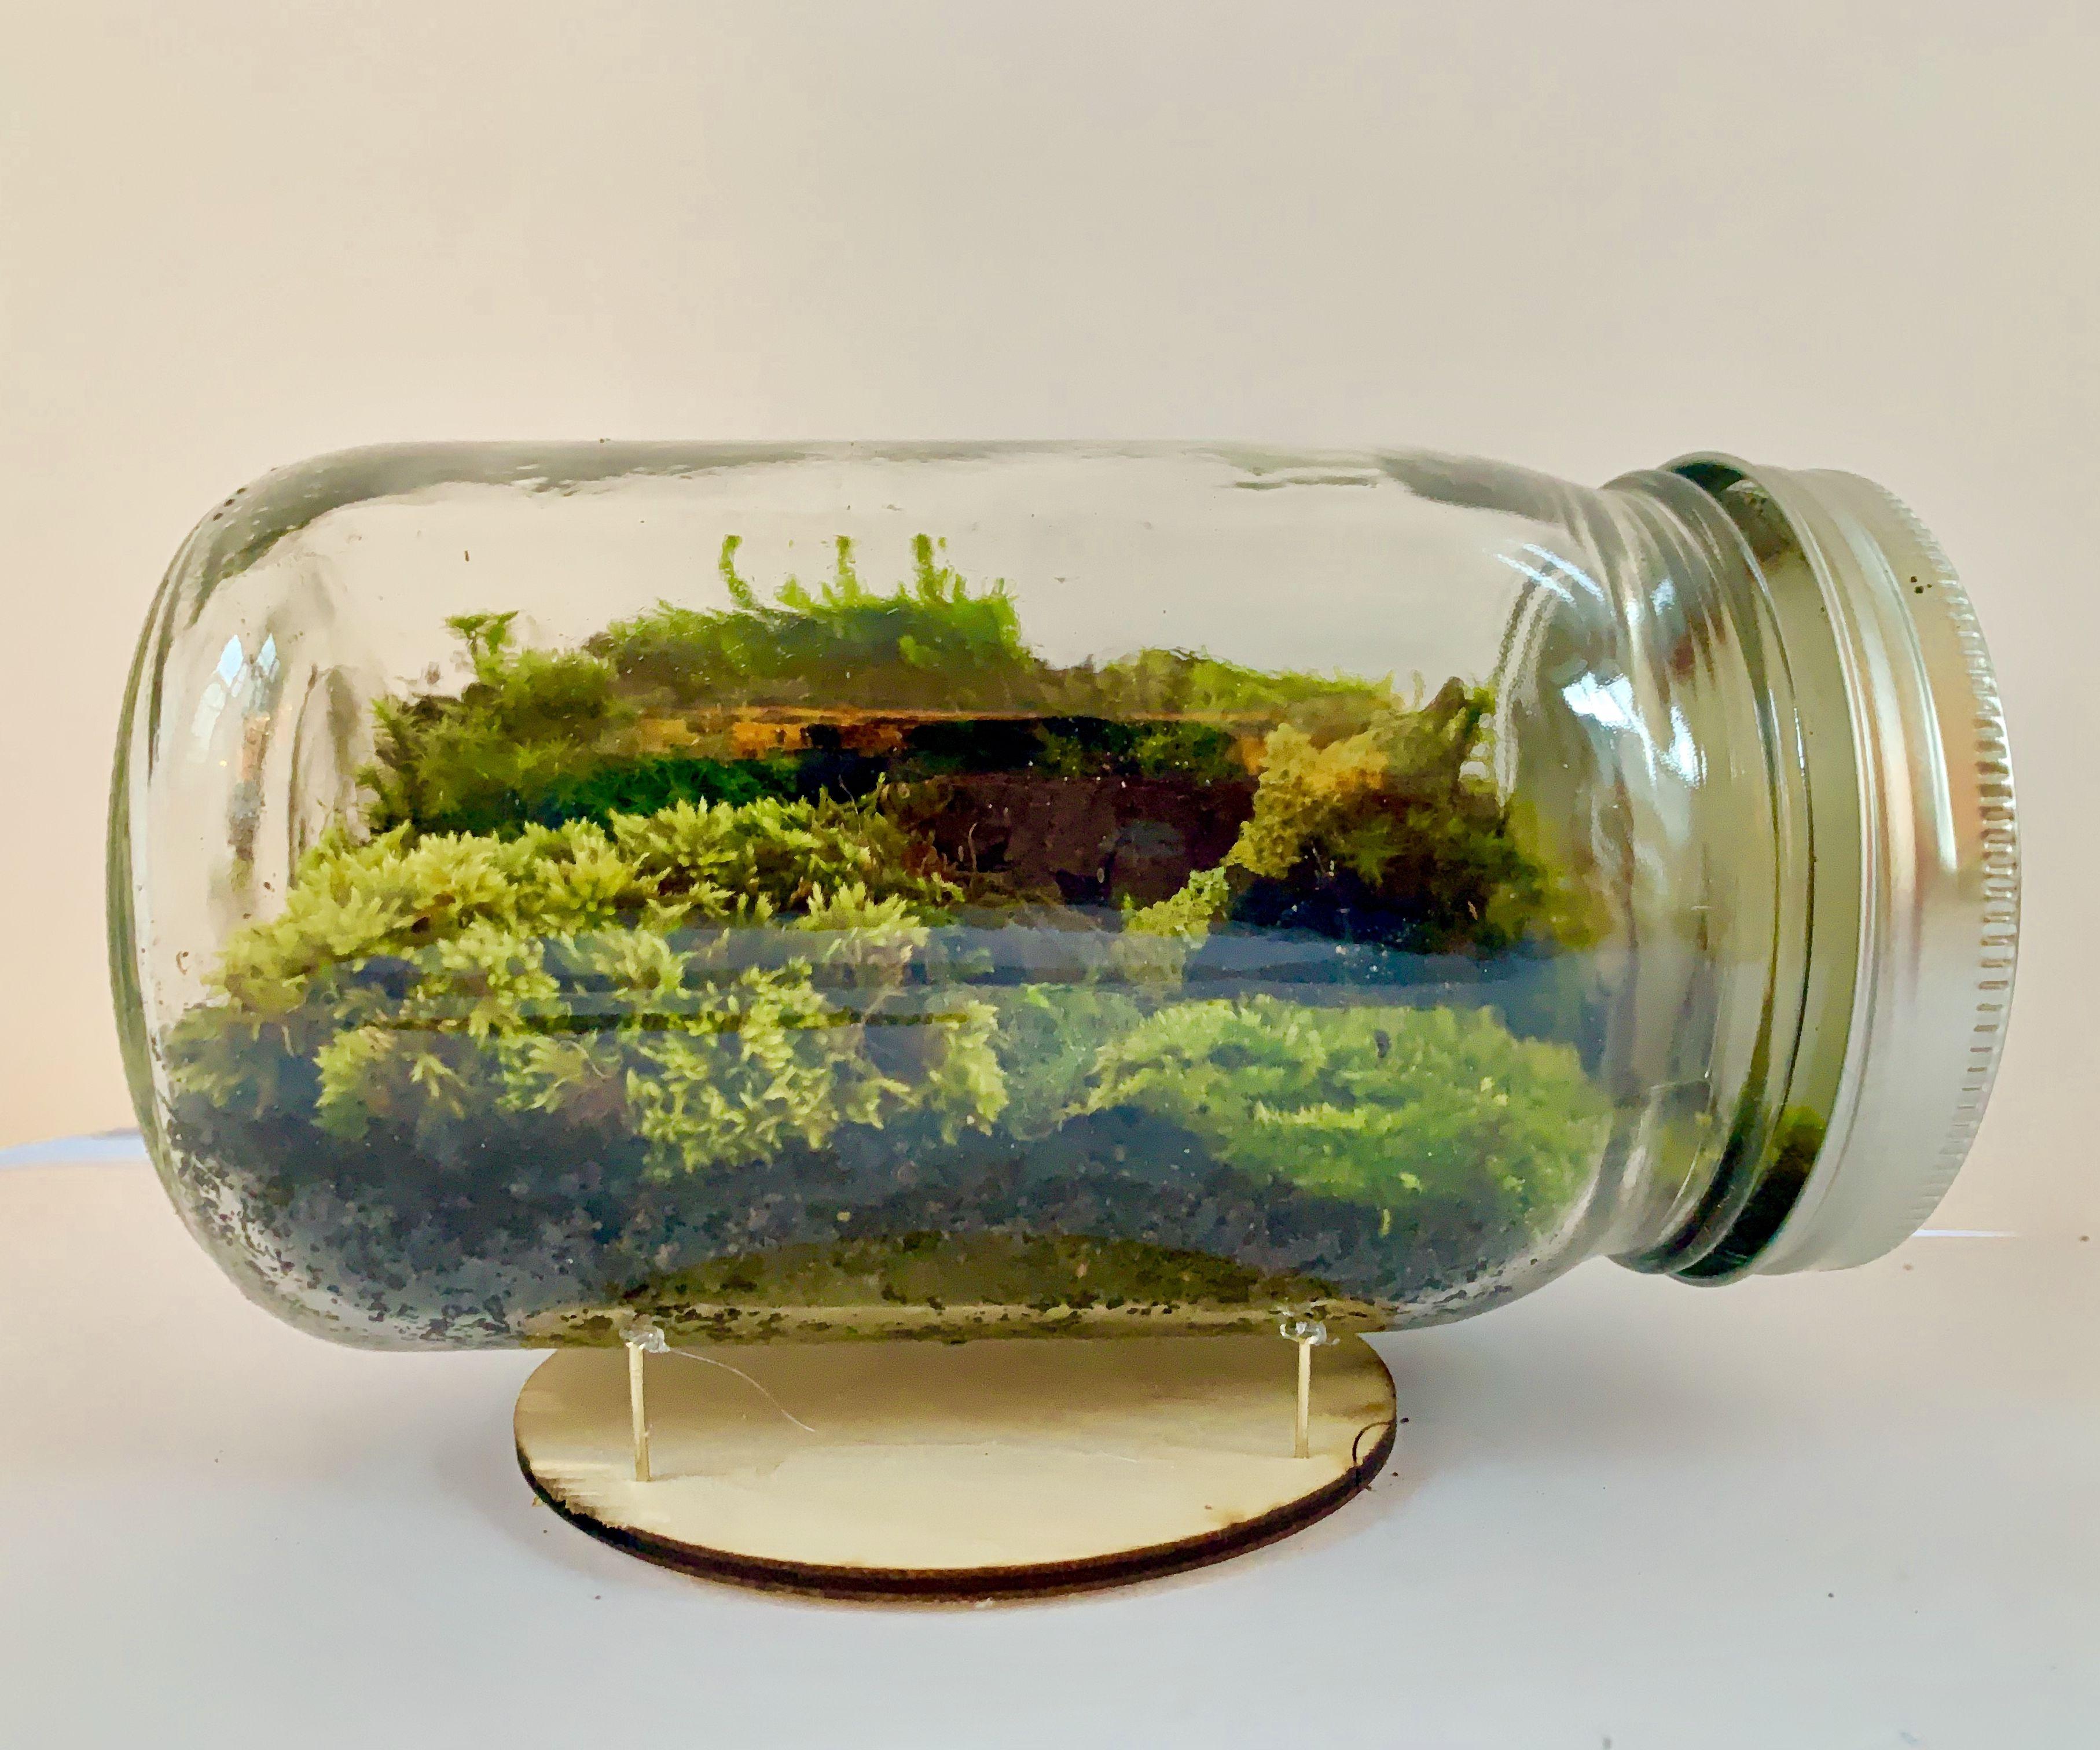 How To Build A Mason Jar Terrarium 7 Steps Instructables